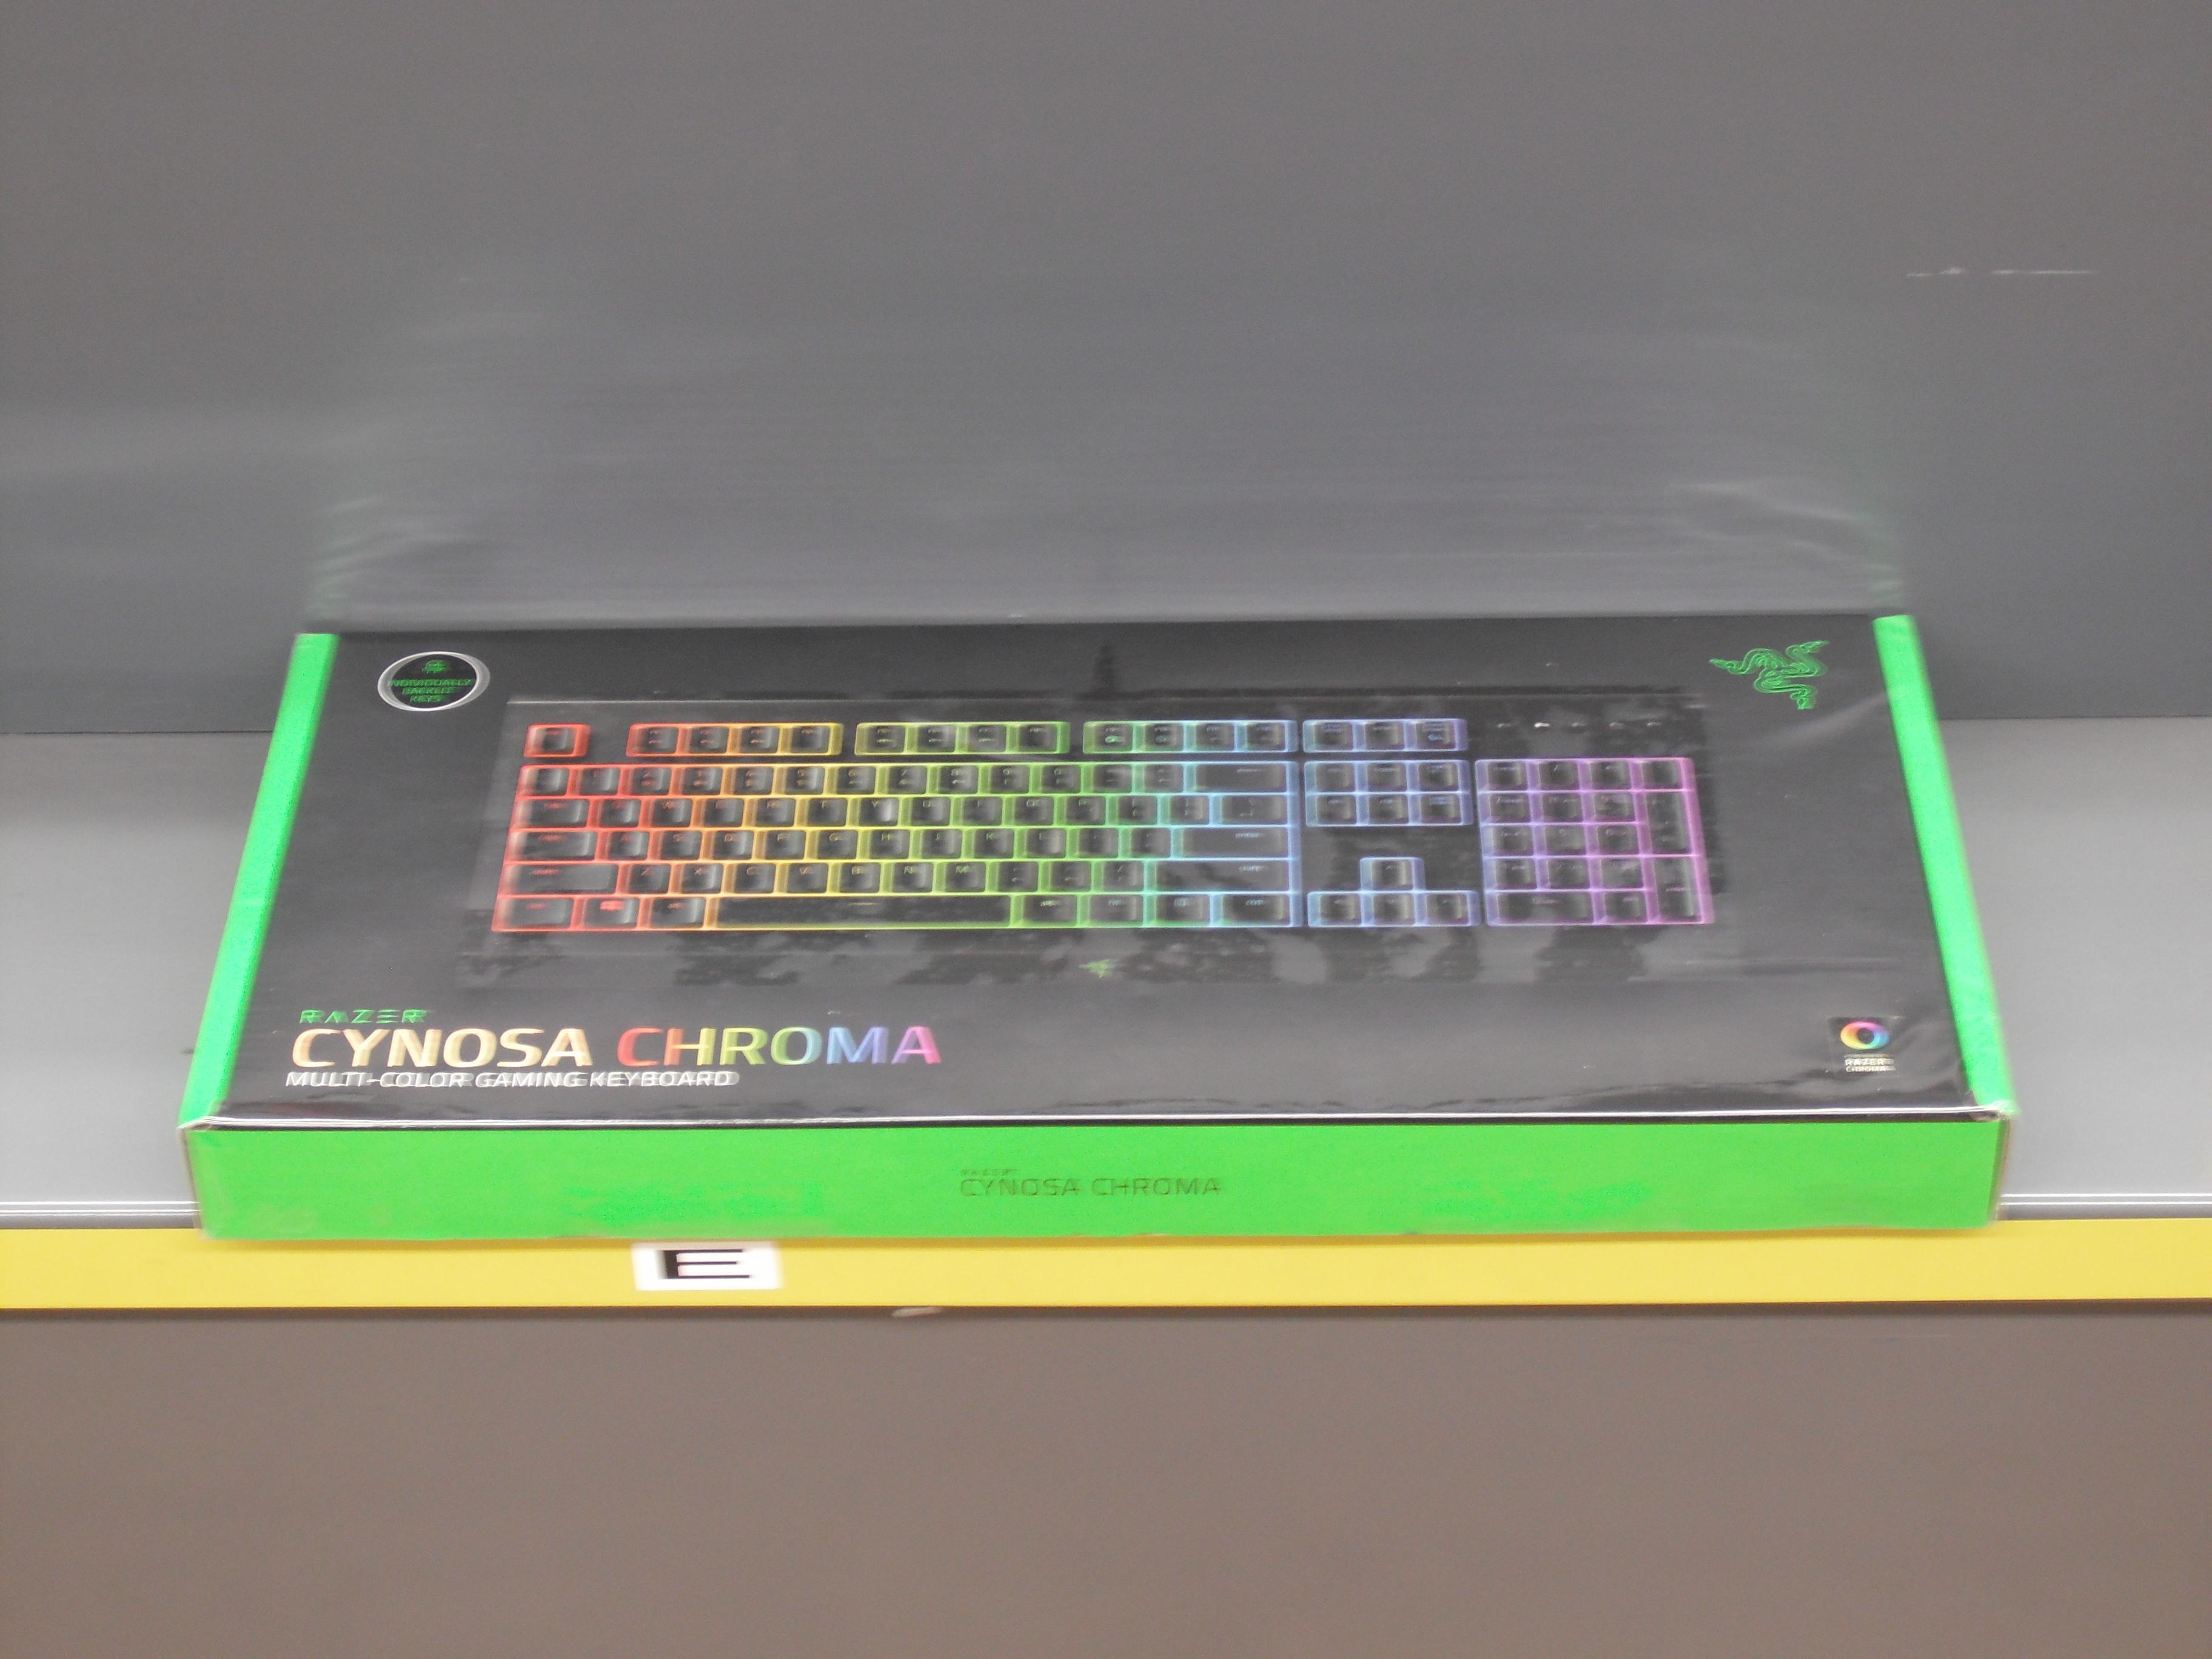 RAZER ゲーミングキーボード RZ03-02262300-R3J1| ハードオフ西尾店